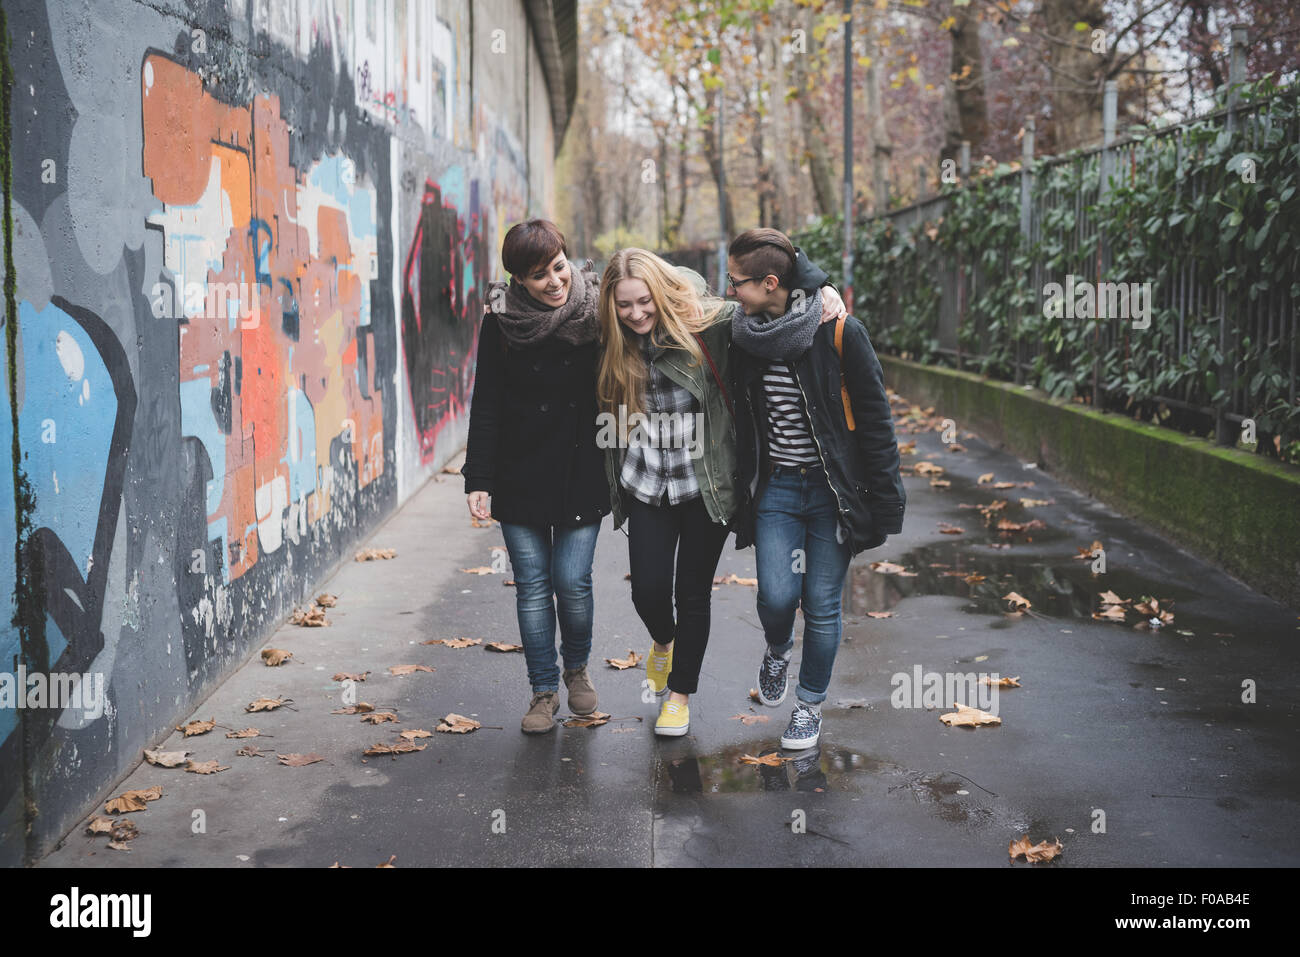 Three sisters walking by graffiti wall - Stock Image